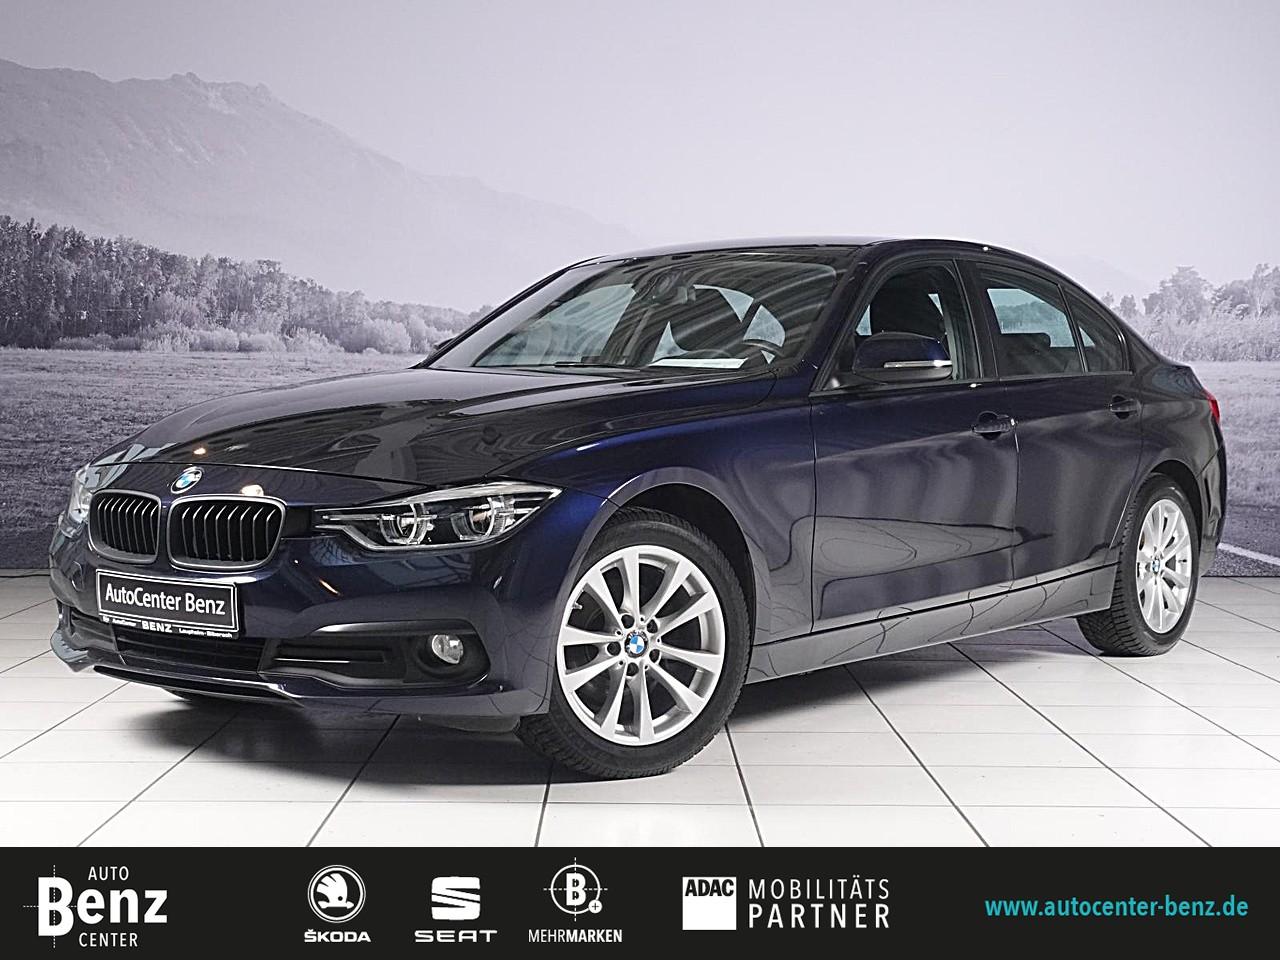 BMW 316d Lim. Advantage *LED*NAVI*PDC*SITZH*TEMPOMAT, Jahr 2017, Diesel